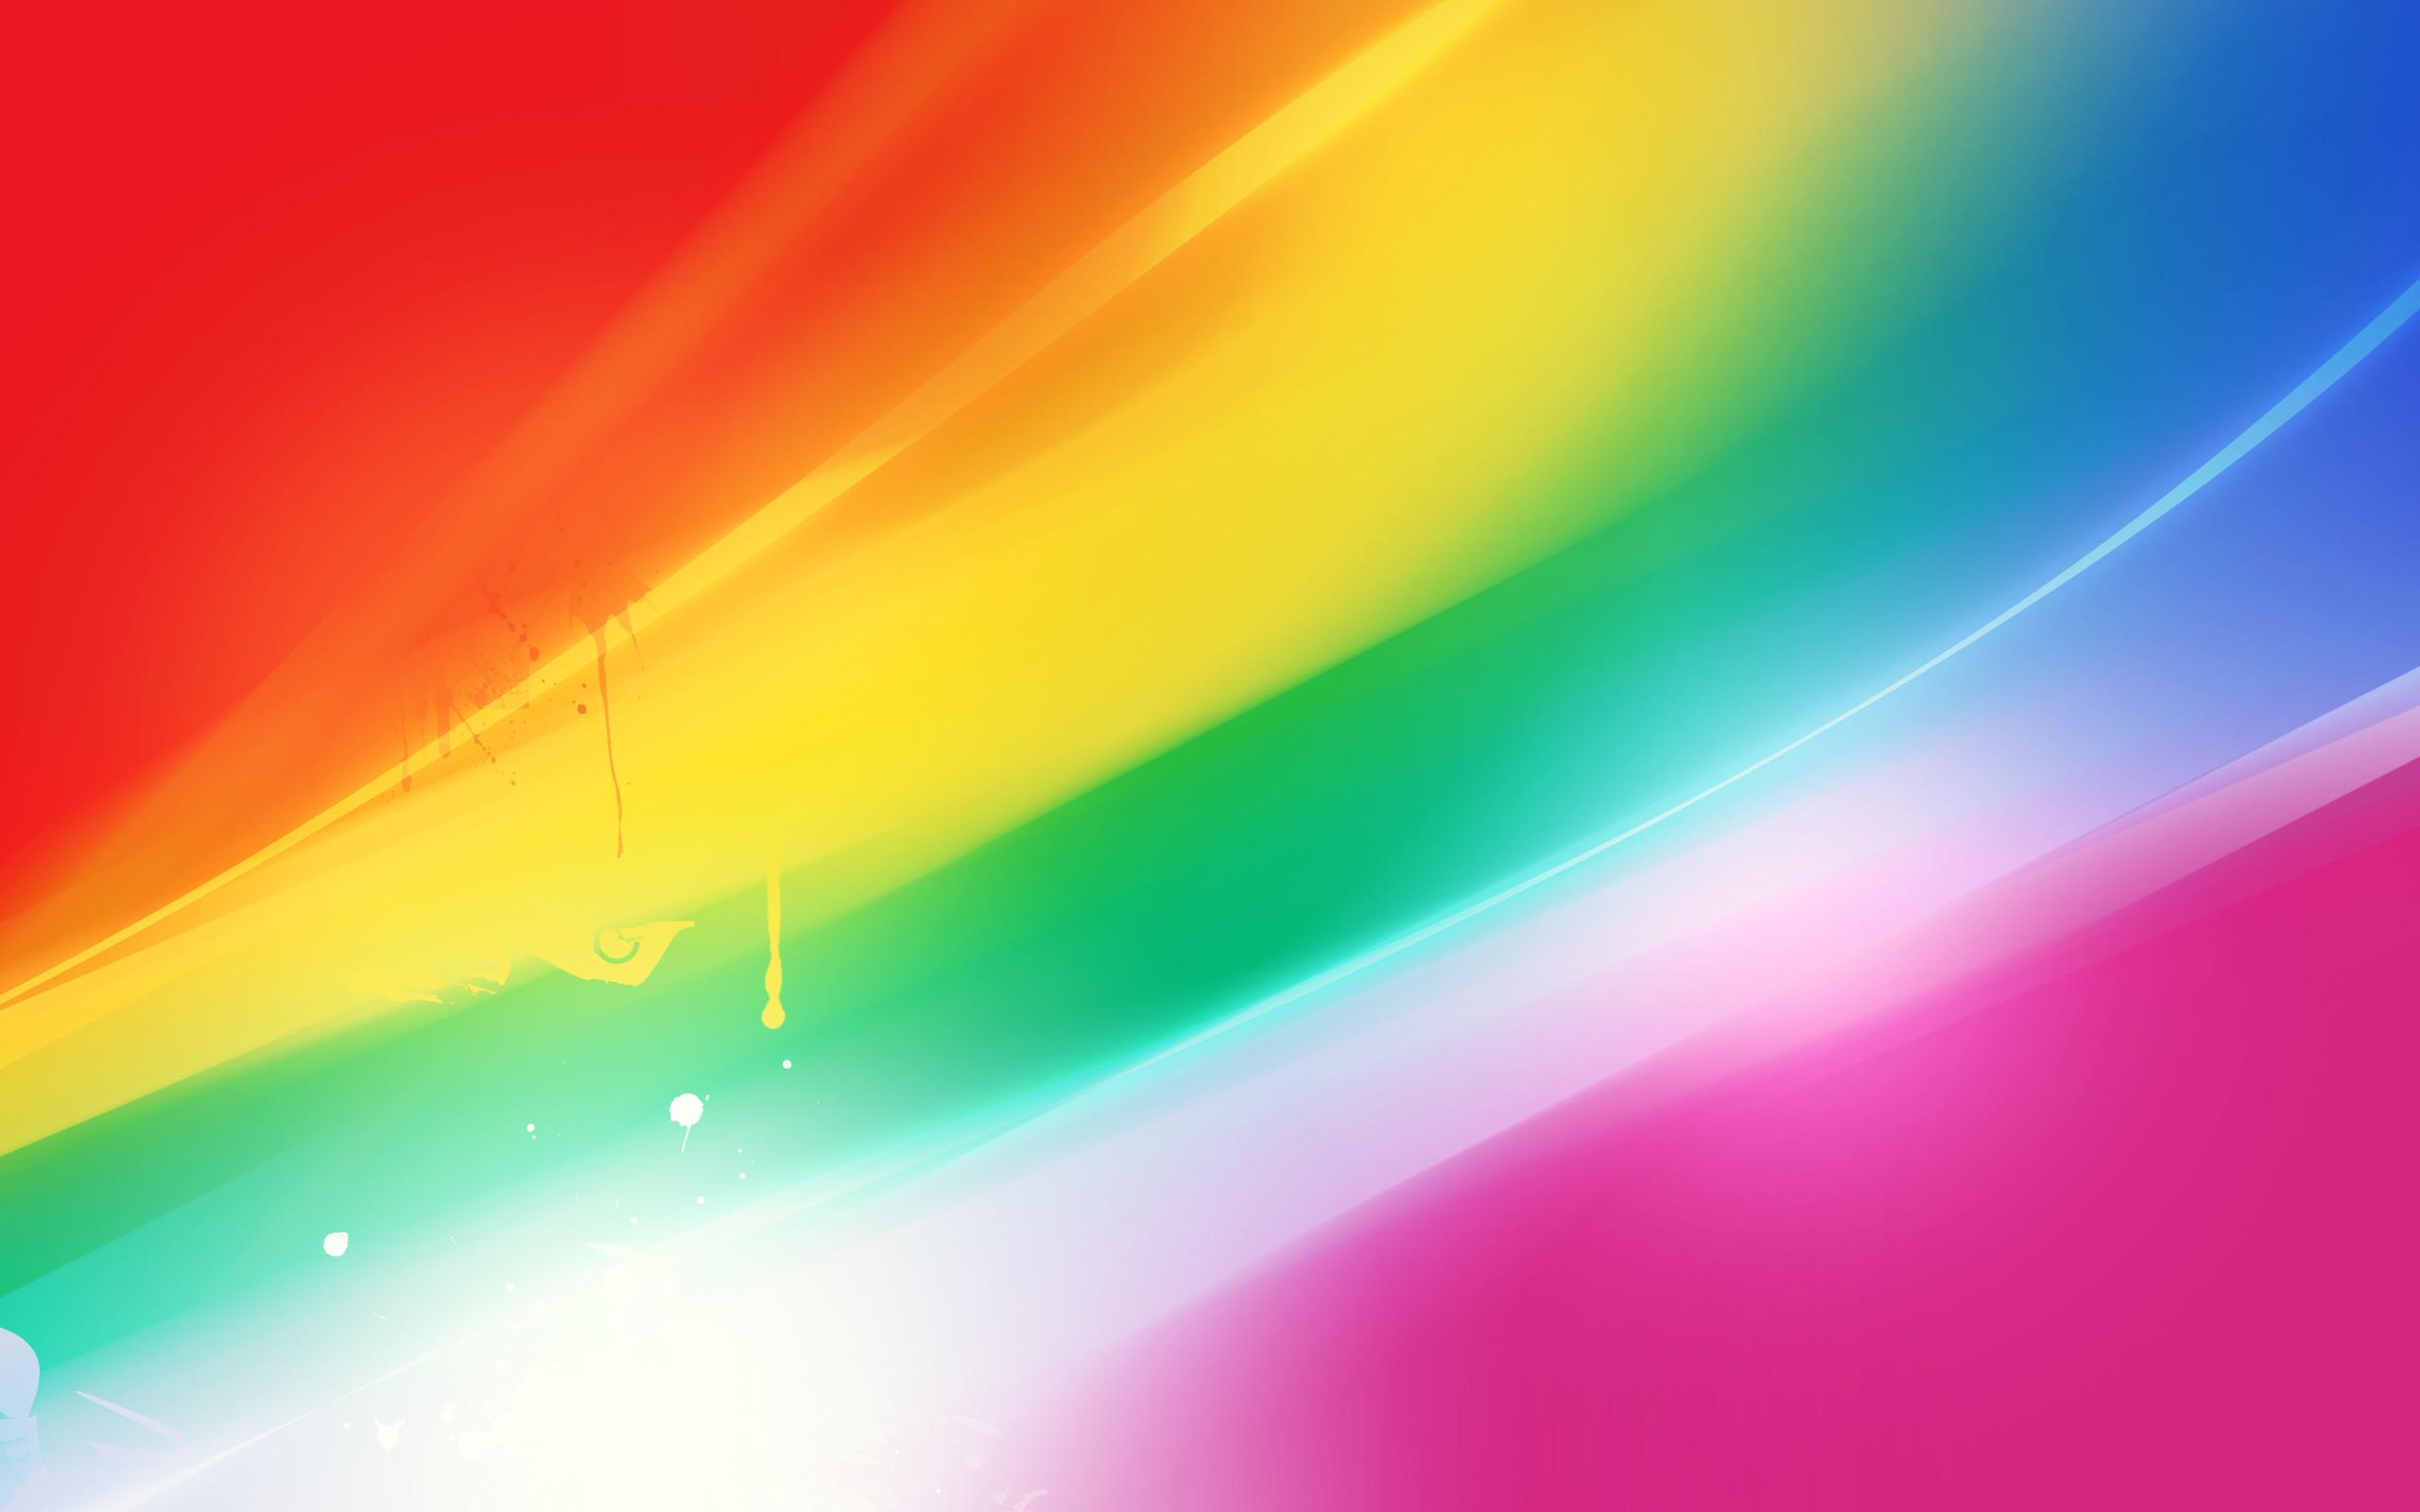 HD Wallpaper   Background ID:27807. 2560x1600 Artistic Colors